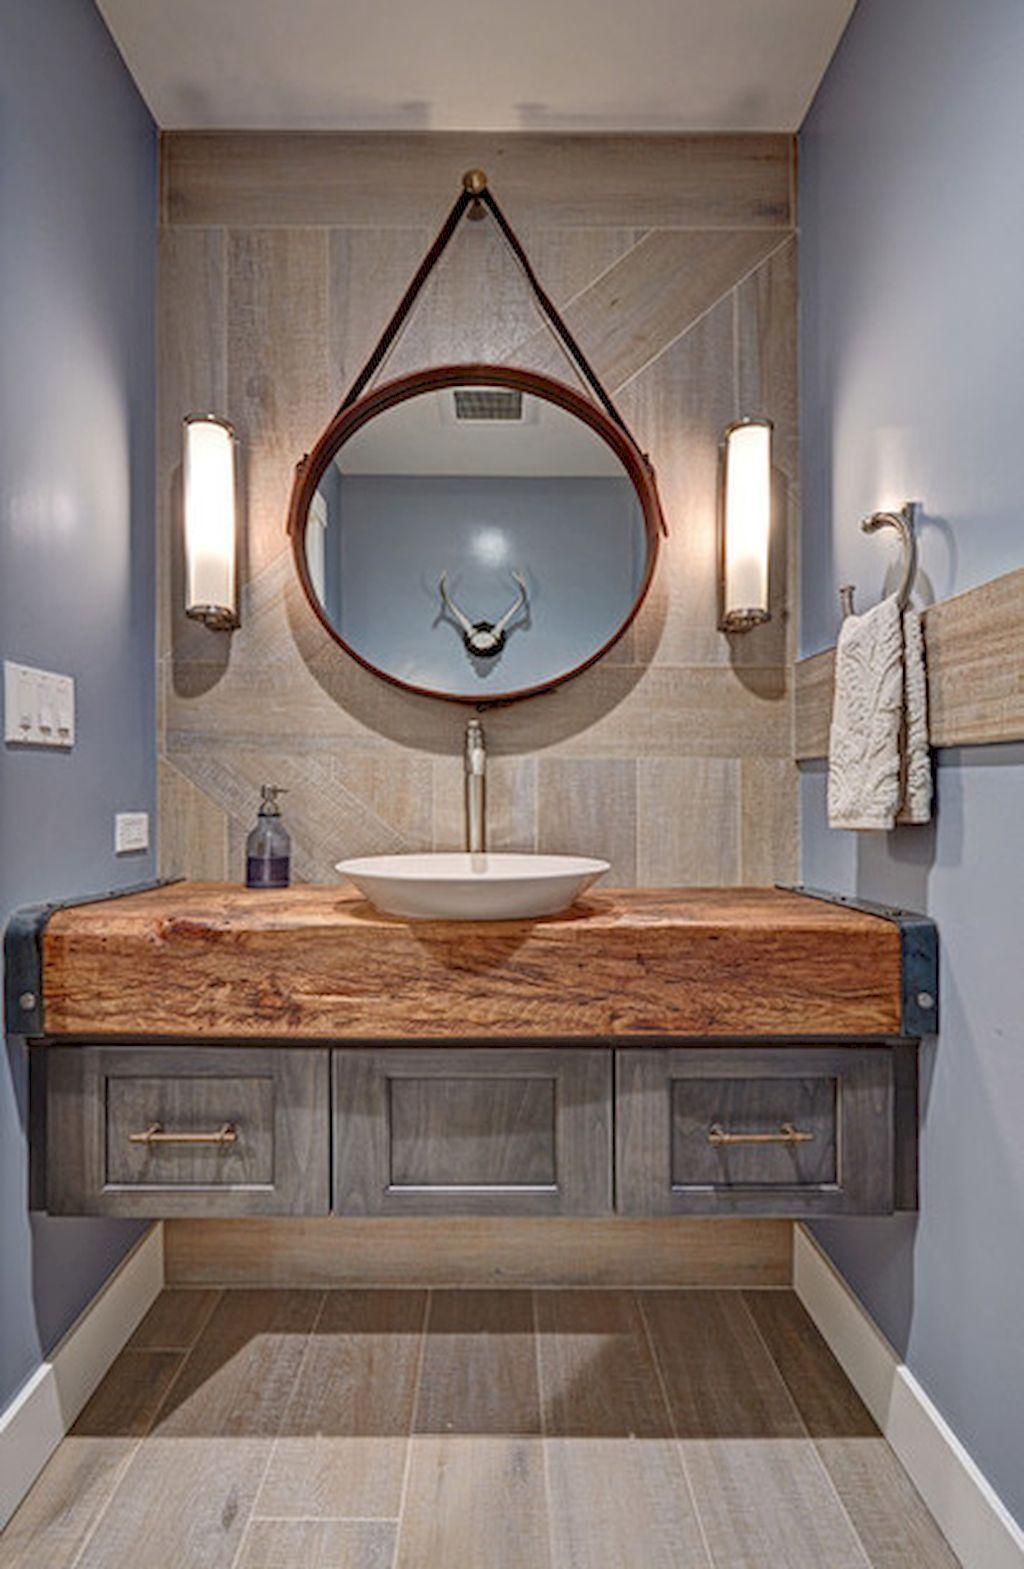 60 Cool Rustic Powder Room Design Ideas 34